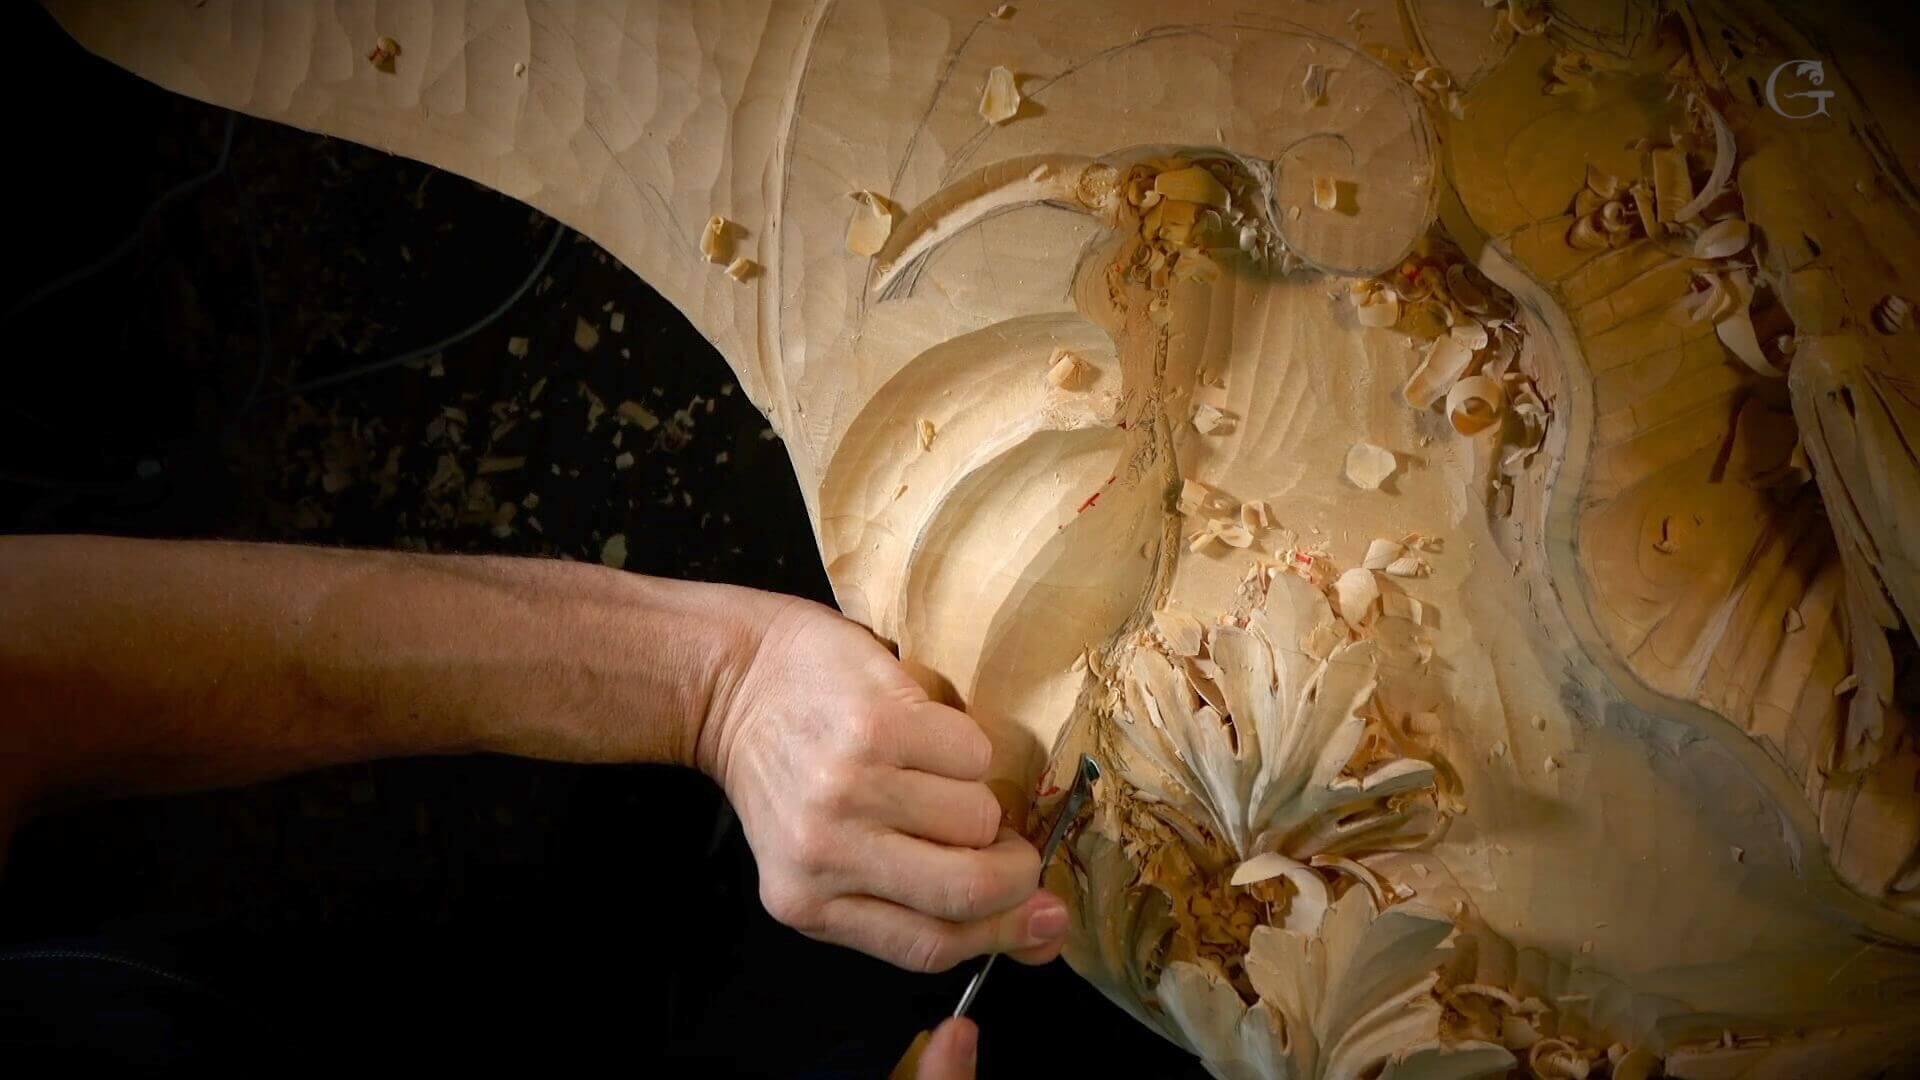 Venetian Style wood Carving -Wood Carving School online- Carving Venice Room Woodcarving course - Authentic Rococo 15th century design - Woodcarving Course online https://schoolofwoodcarving.com/ @woodcarvergrabovetskiy #todaysmaker #craft #skills #makersgonnamake #knowledge #carving #woodworker #woodwork #wooddesign #woodfurniture #interiordesign #carvingwood #woodworking #woodlovers #carpenter #dowoodworking #diy #finewoodworking #woodcraft #artisan #woodcarving #woodart #finewoodworking #handcrafted #idea #woodcarver #woodcarvers #woodcarvingart Learn Wood Carving in Rococo style 15th 16th-century Design. Woodcarving School online. School of Woodworking online. Afrikaans: Leer houtsneewerk in Rococo-styl uit die 16de eeu-ontwerp. Houtsneeskool aanlyn. Skool vir Houtbewerking aanlyn. Arabic: تعلم نحت الخشب بأسلوب الروكوكو تصميم القرن الخامس عشر. مدرسة نحت الخشب على الانترنت. مدرسة النجارة على الانترنت. Azerbaijani: Rokoko üslubunda taxta oyma məlumatlarını öyrənin 15-ci 16-cı əsr Dizayn. Woodcarving School online. İnternetdə ağac emalı məktəbi. Belarusian: Вывучыце разьбу па дрэве ў стылі ракако Дызайн 15-га стагоддзя 16-га стагоддзя. Разьба па дрэве ў Інтэрнэце. Школа дрэваапрацоўкі ў Інтэрнэце. Bulgarian: Научете дърворезбата в стил рококо 15-ти век от 16-ти век. Училище за дърворезба онлайн. Училище по дървообработка онлайн. Bengali: রোকো স্টাইল 15 তম 16 শতকের ডিজাইনে কাঠের খোদাই শিখুন। উডকারভিং স্কুল অনলাইন। অনলাইনে উড ওয়ার্কিং স্কুল। Bosnian: Naučite rezbarenje drveta u stilu rokokoa iz 15. veka. Škola rezbarenja drveta na mreži. Škola obrade drveta online. Catalan: Coneix la talla de fusta en estil rococó disseny del segle XV. Escola de talla en línia Escuela de Fusteria en línia. Cebuano: Hibal-i ang Pagkulit sa kahoy sa istilo sa Rococo nga ika-15 nga Disenyo sa ika-16 nga siglo. Woodcarving School online. School sa Pagtrabaho sa kahoy online. Czech: Naučte se řezbářství v rokokovém designu 15. 16. století. Dřevařská škola online. Škola zpracování dřeva o